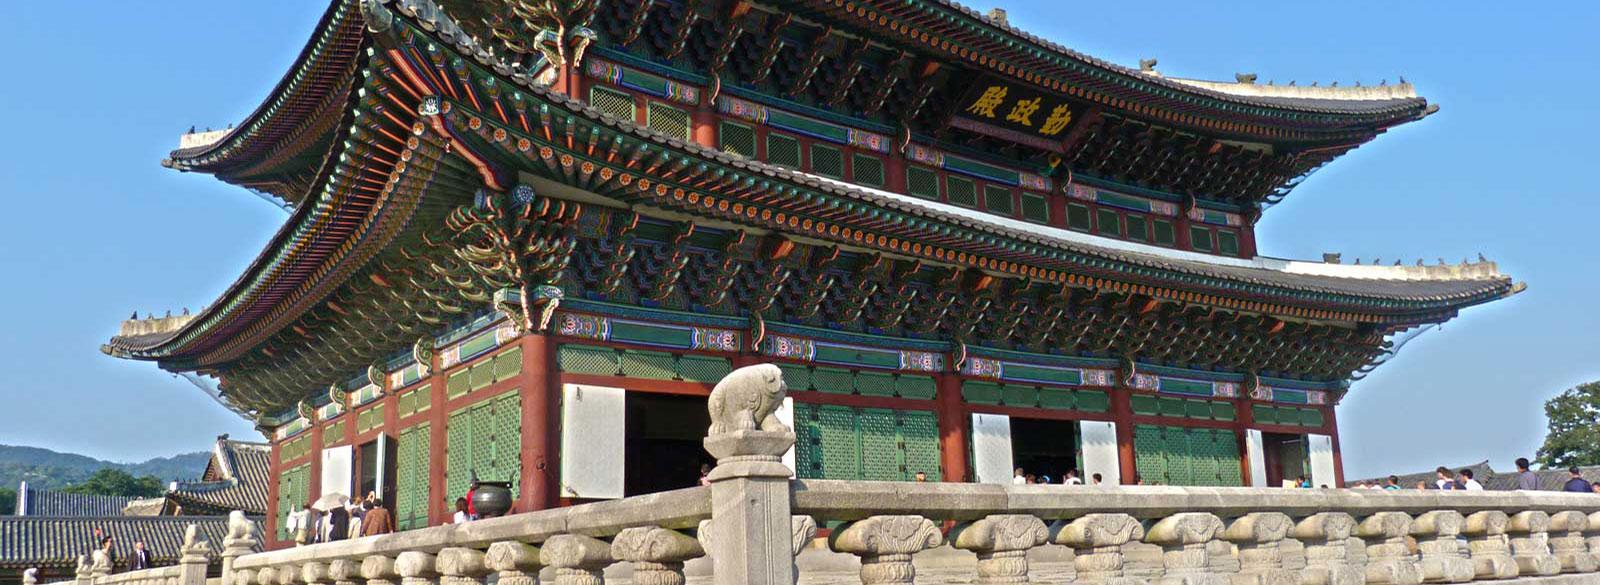 Korea, das ursprungsland des traditionellen Taekwon-Do